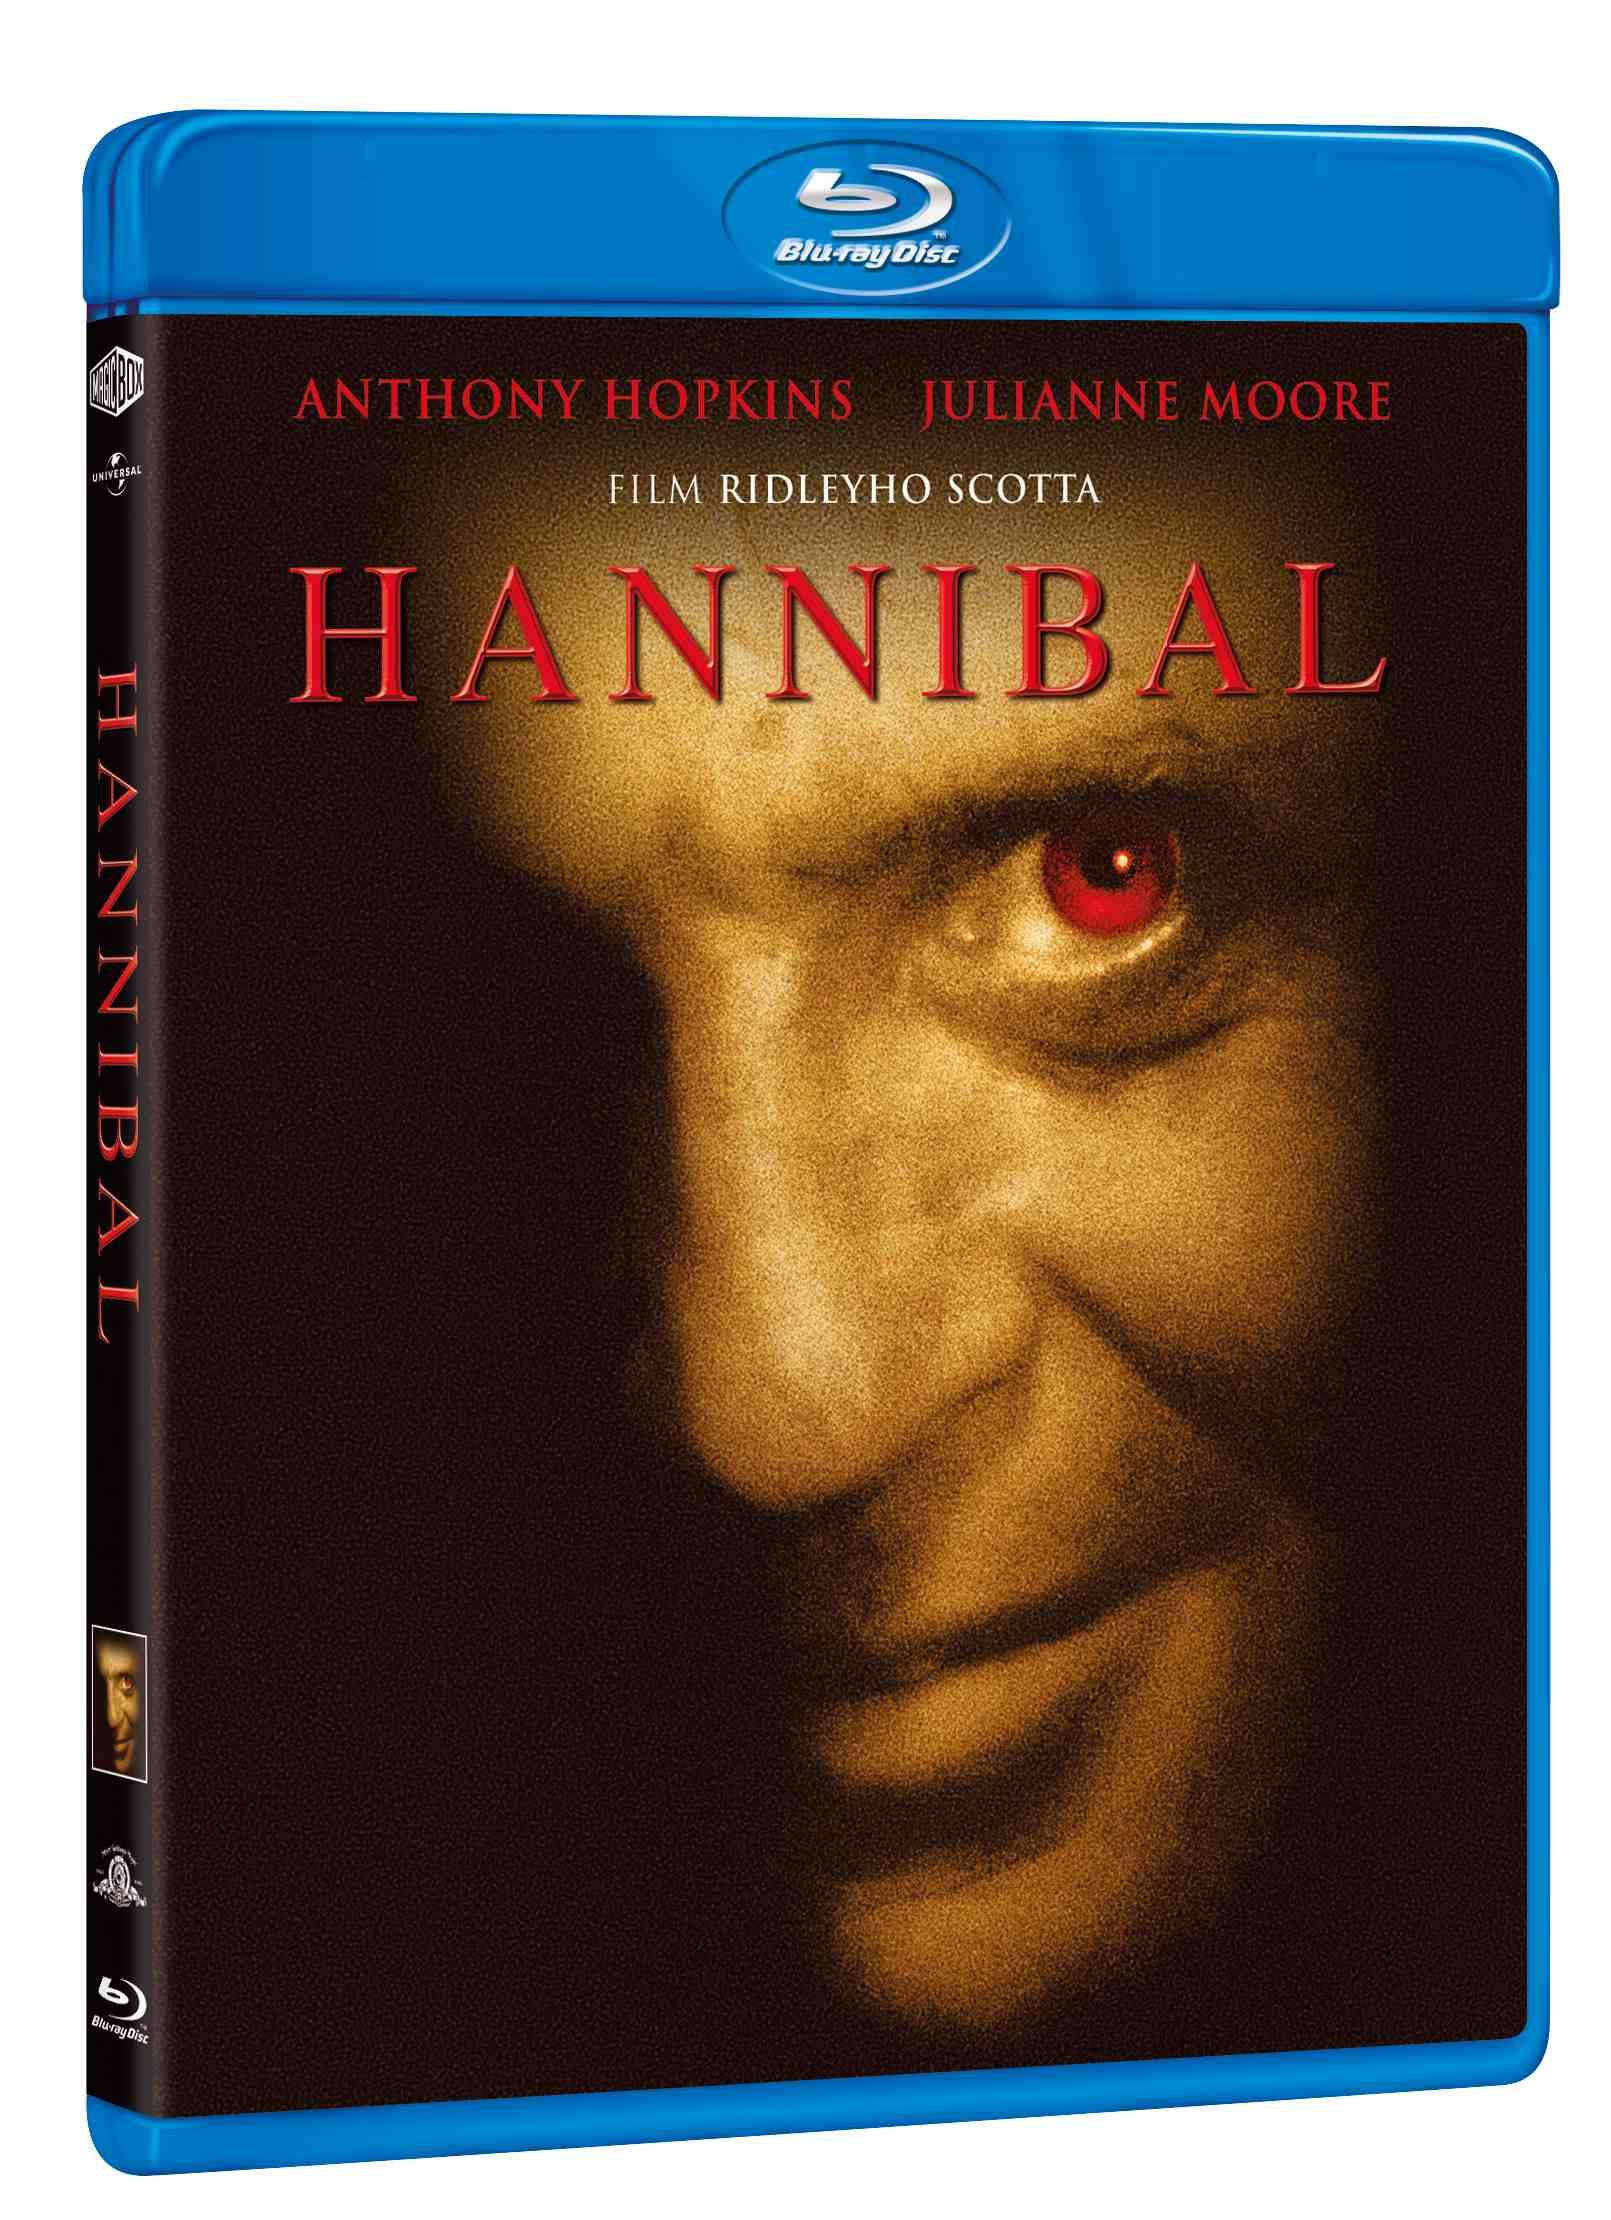 HANNIBAL - Blu-ray